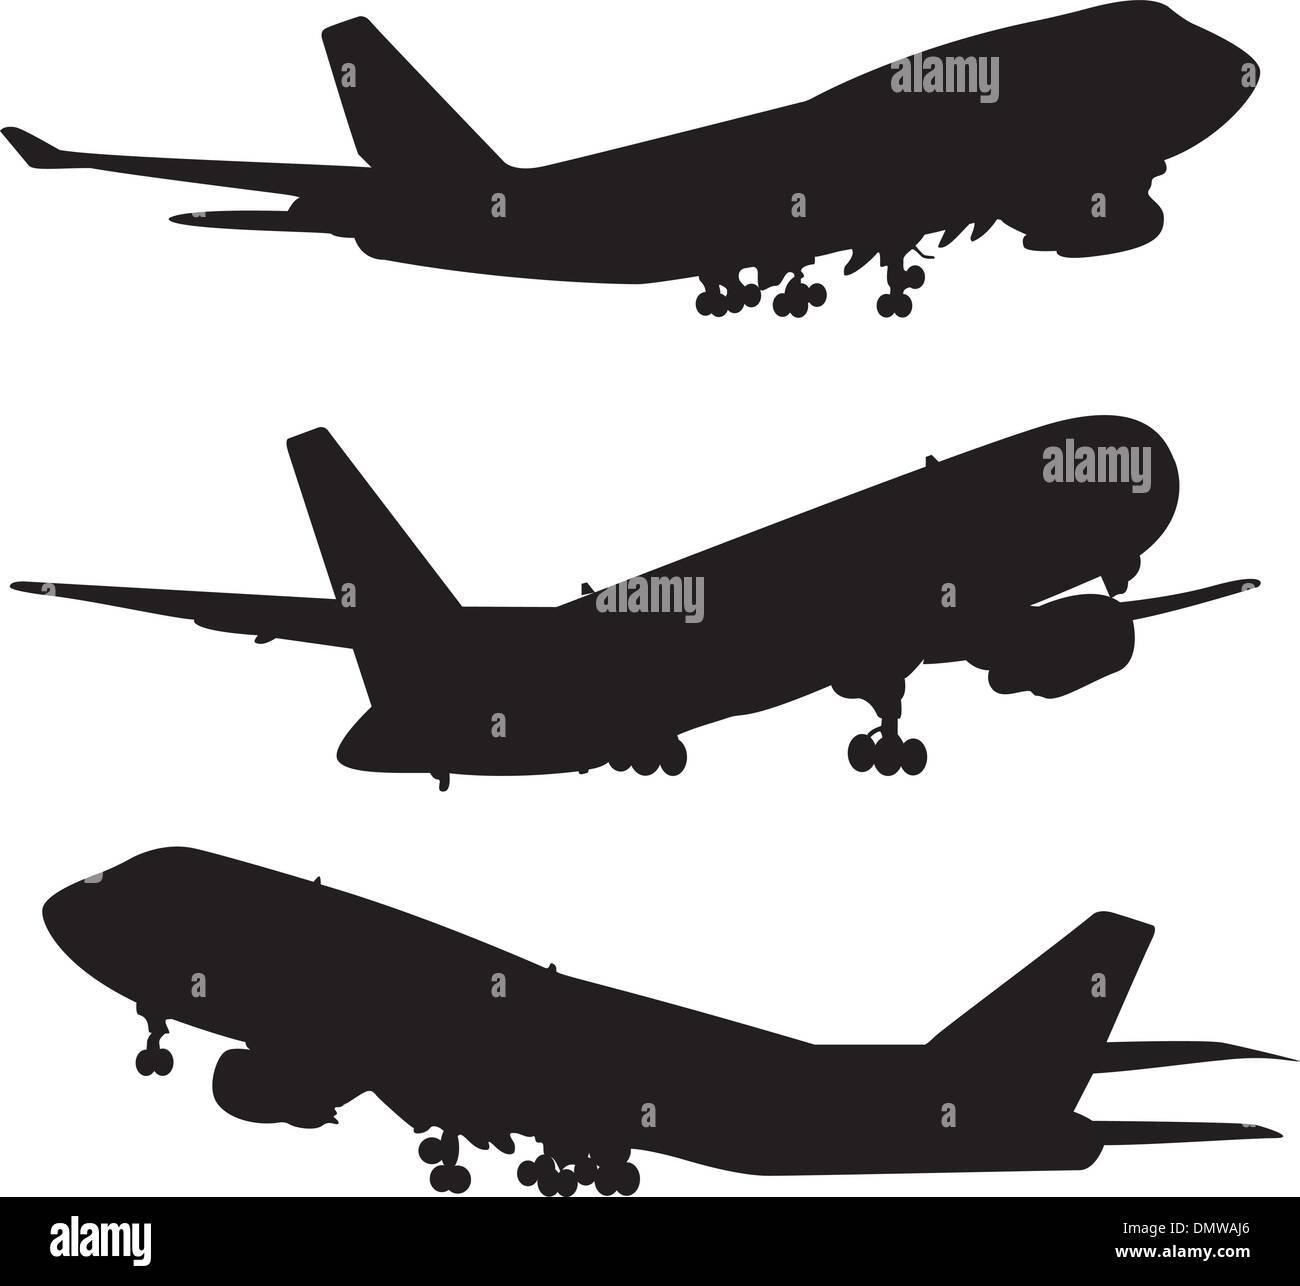 Flugzeug-Silhouette-set Stockbild